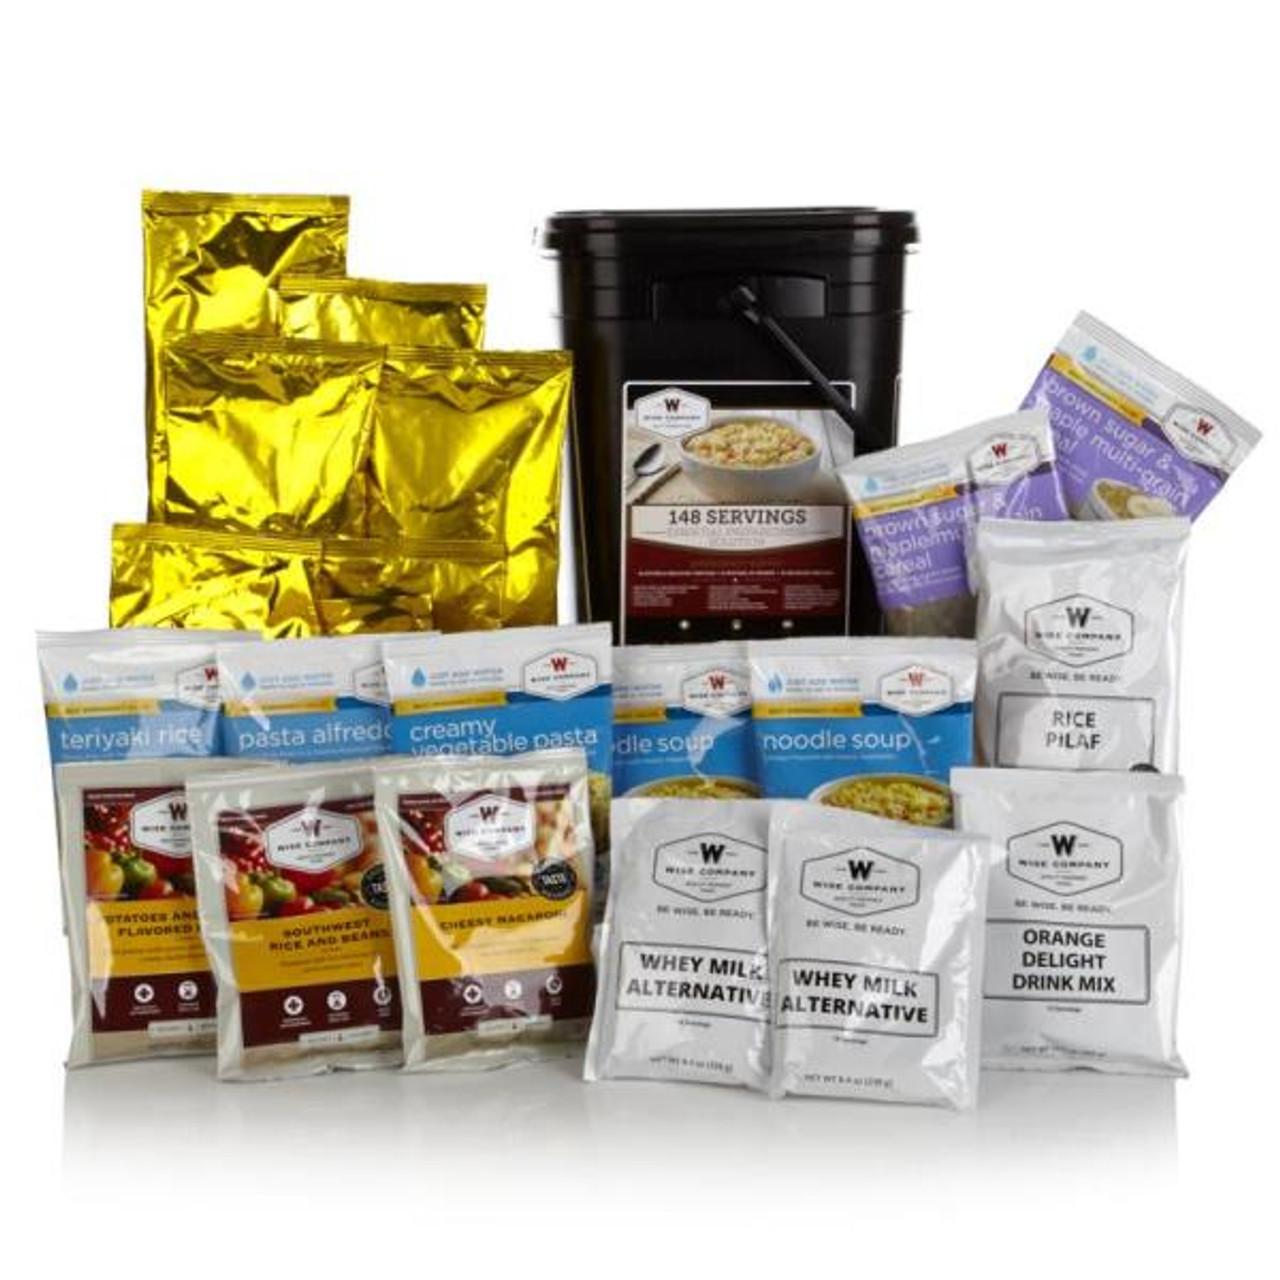 Wise 148 Serving 1 Month Preparedness Kit